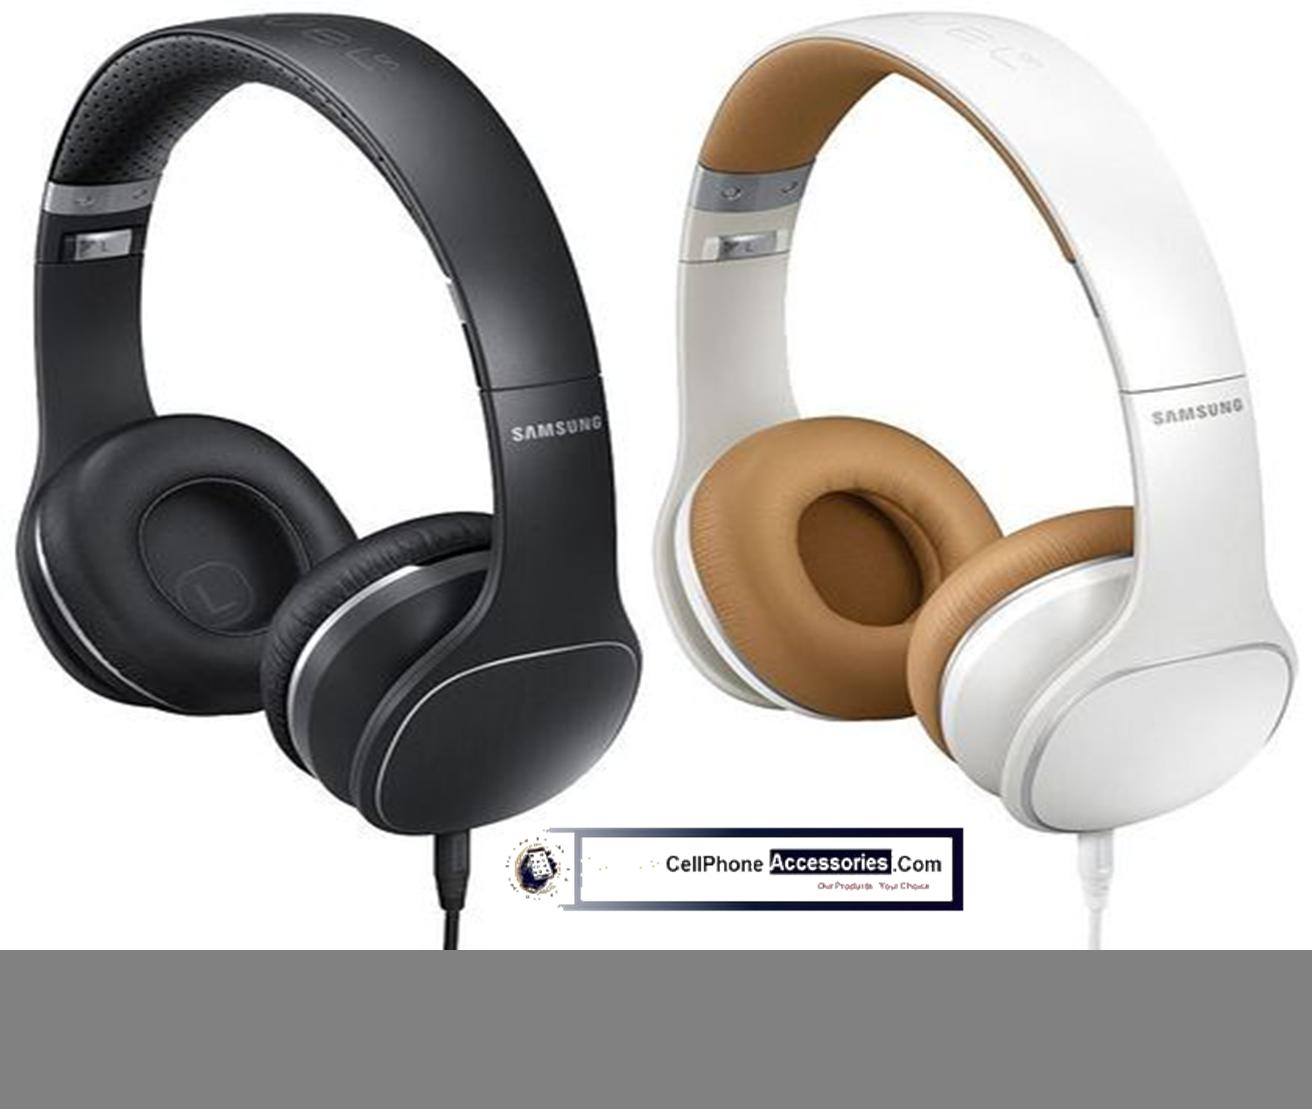 Shop The Best Wireless Bluetooth Headset Online In 2020 Headset Wireless Bluetooth Bluetooth Headset